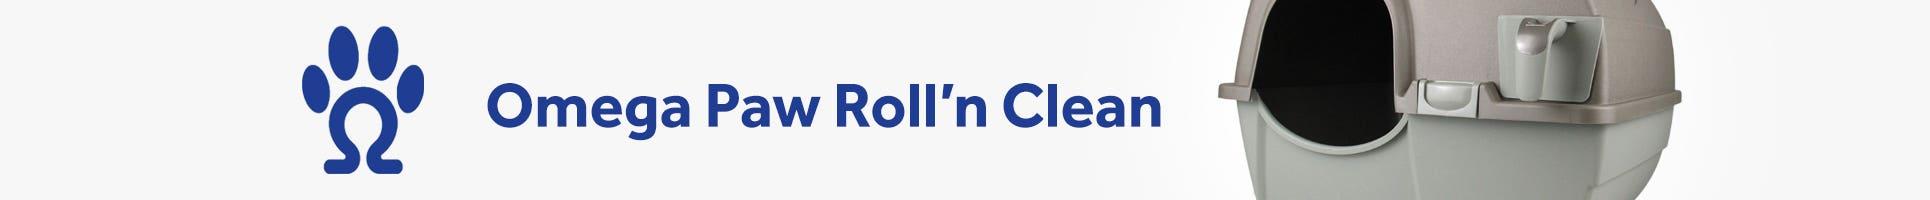 Omega Paw Roll'n Clean